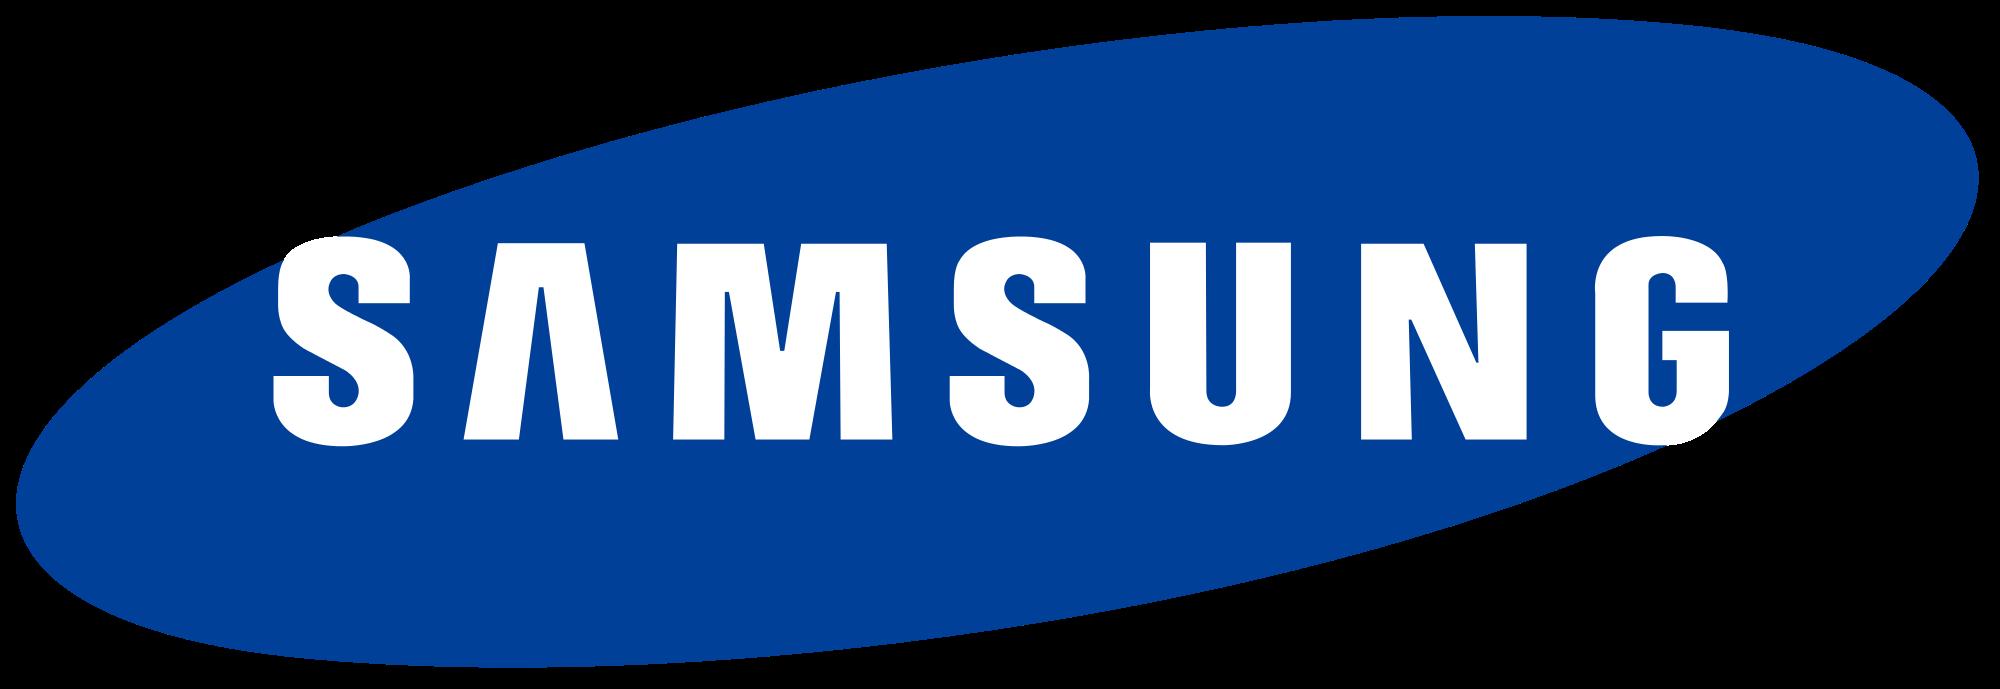 samsung led tv logo. samsung_logo.svg samsung led tv logo